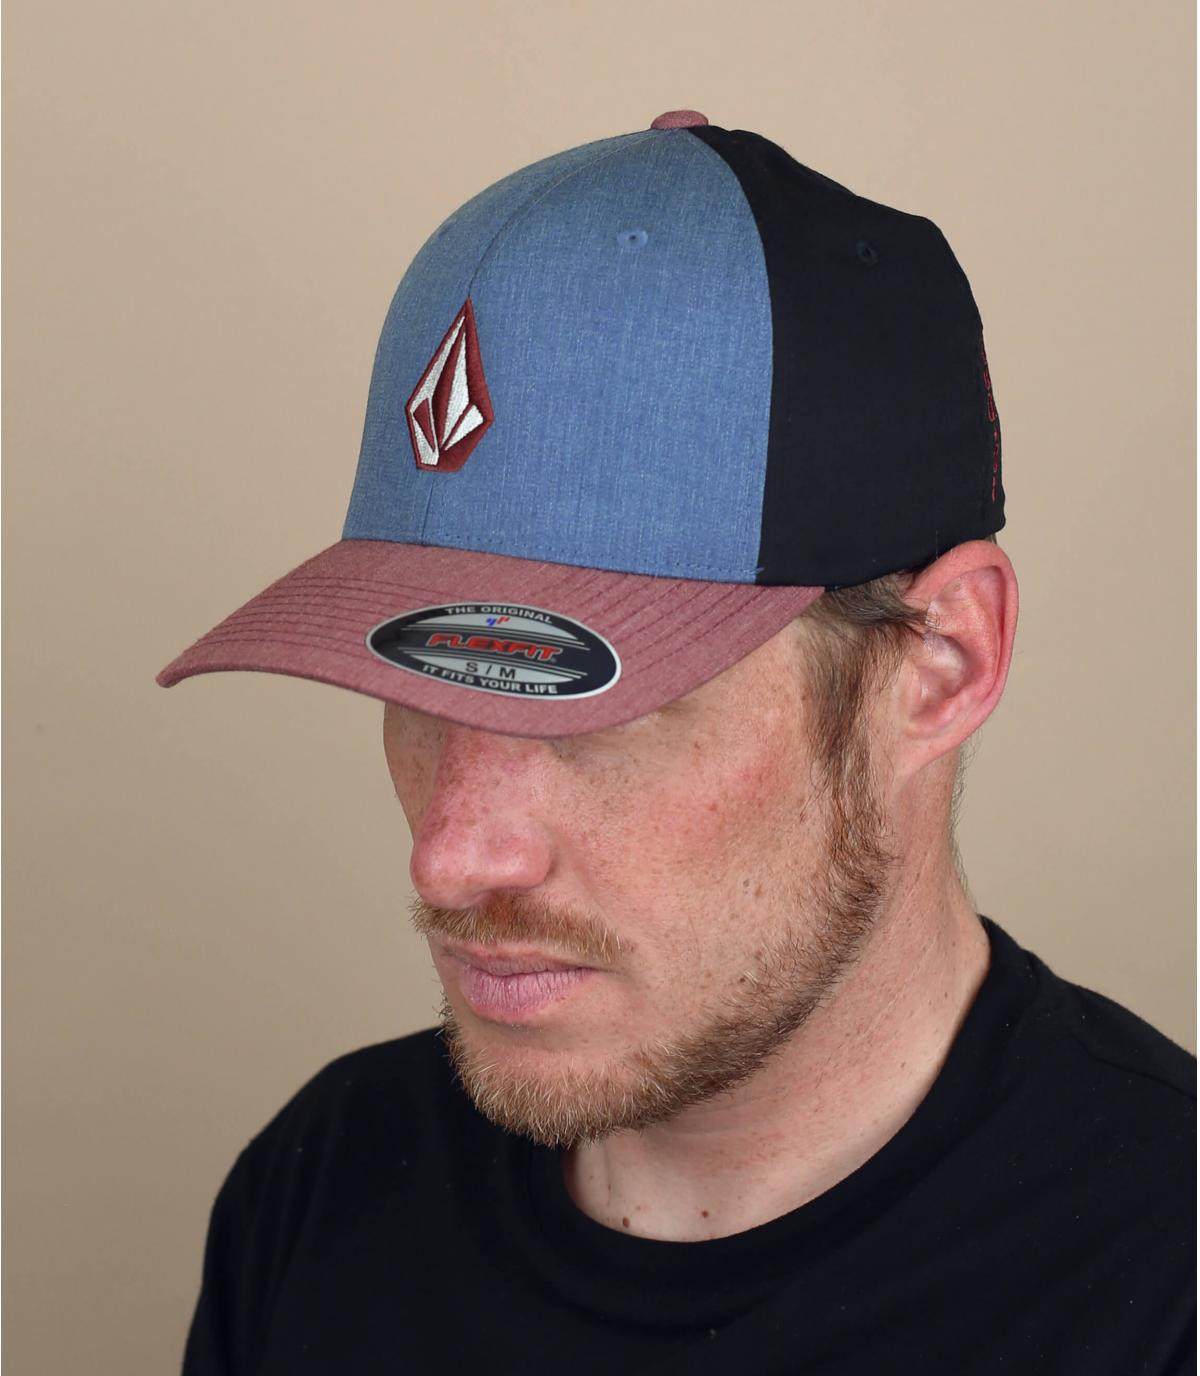 rood blauwe Volcom cap